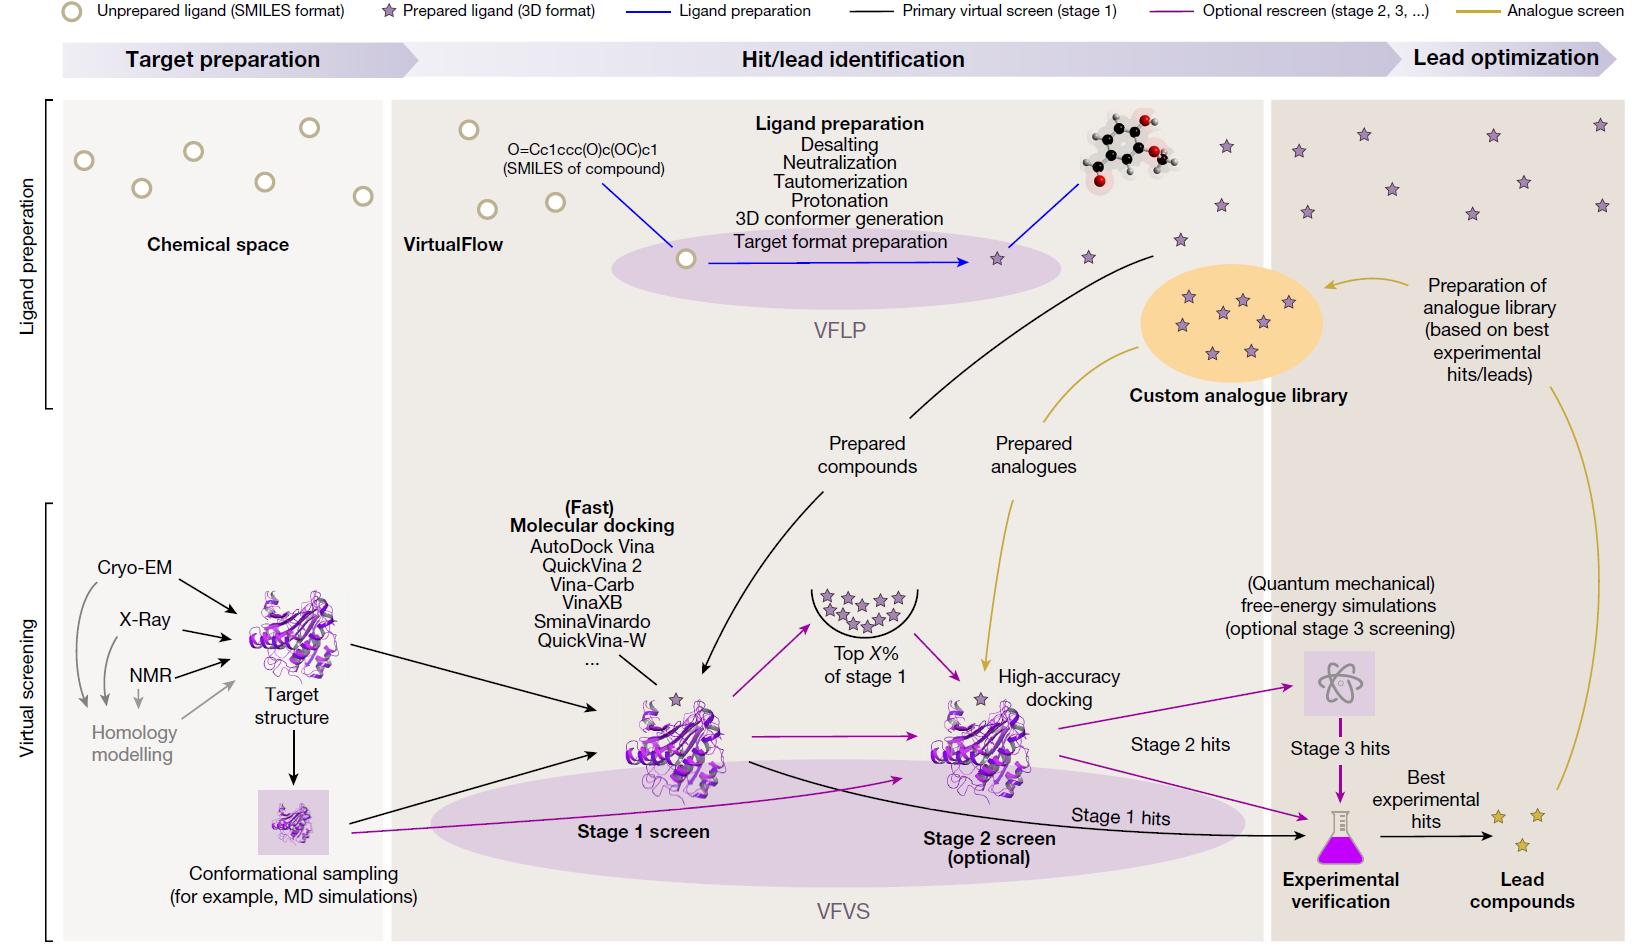 Workflow of Virtual Screening